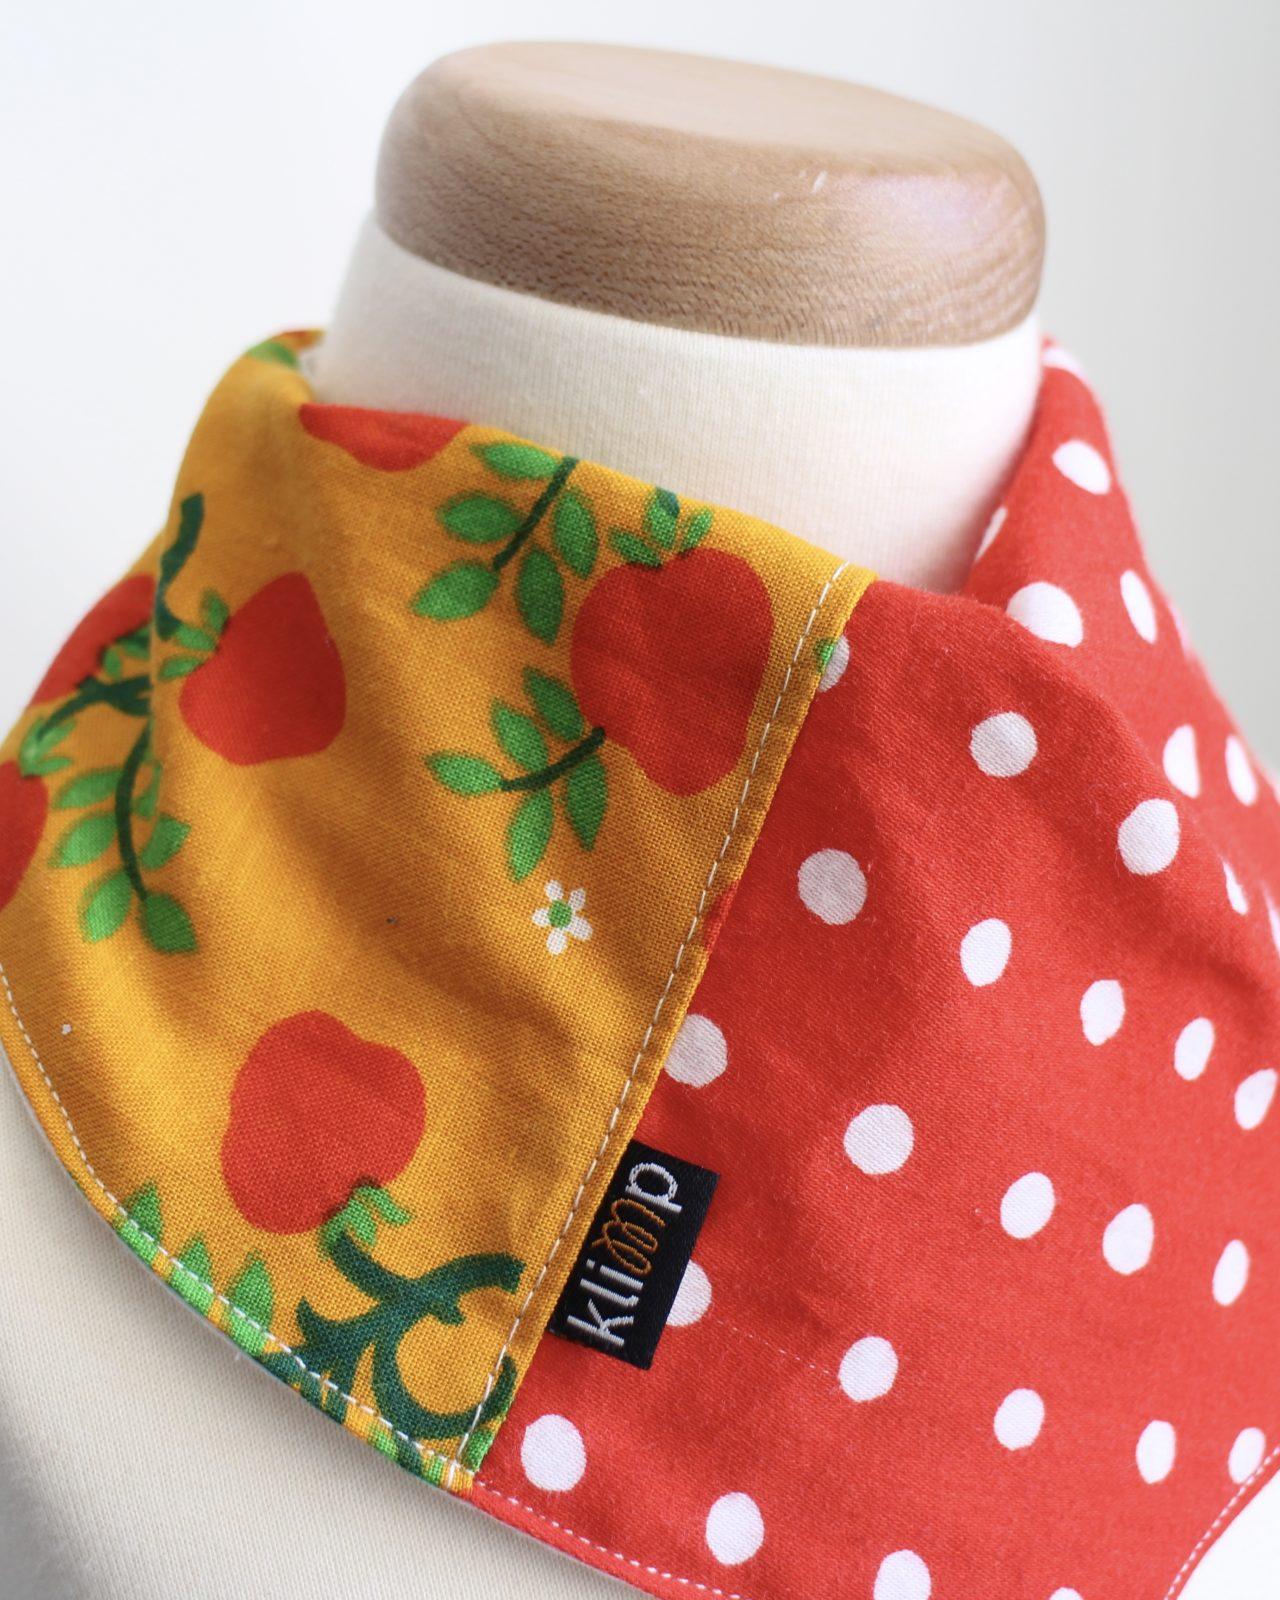 Dregglis Scarf Återbruk Retro Retrotyg Vintage Vintagetyg Barnkläder Babykläder